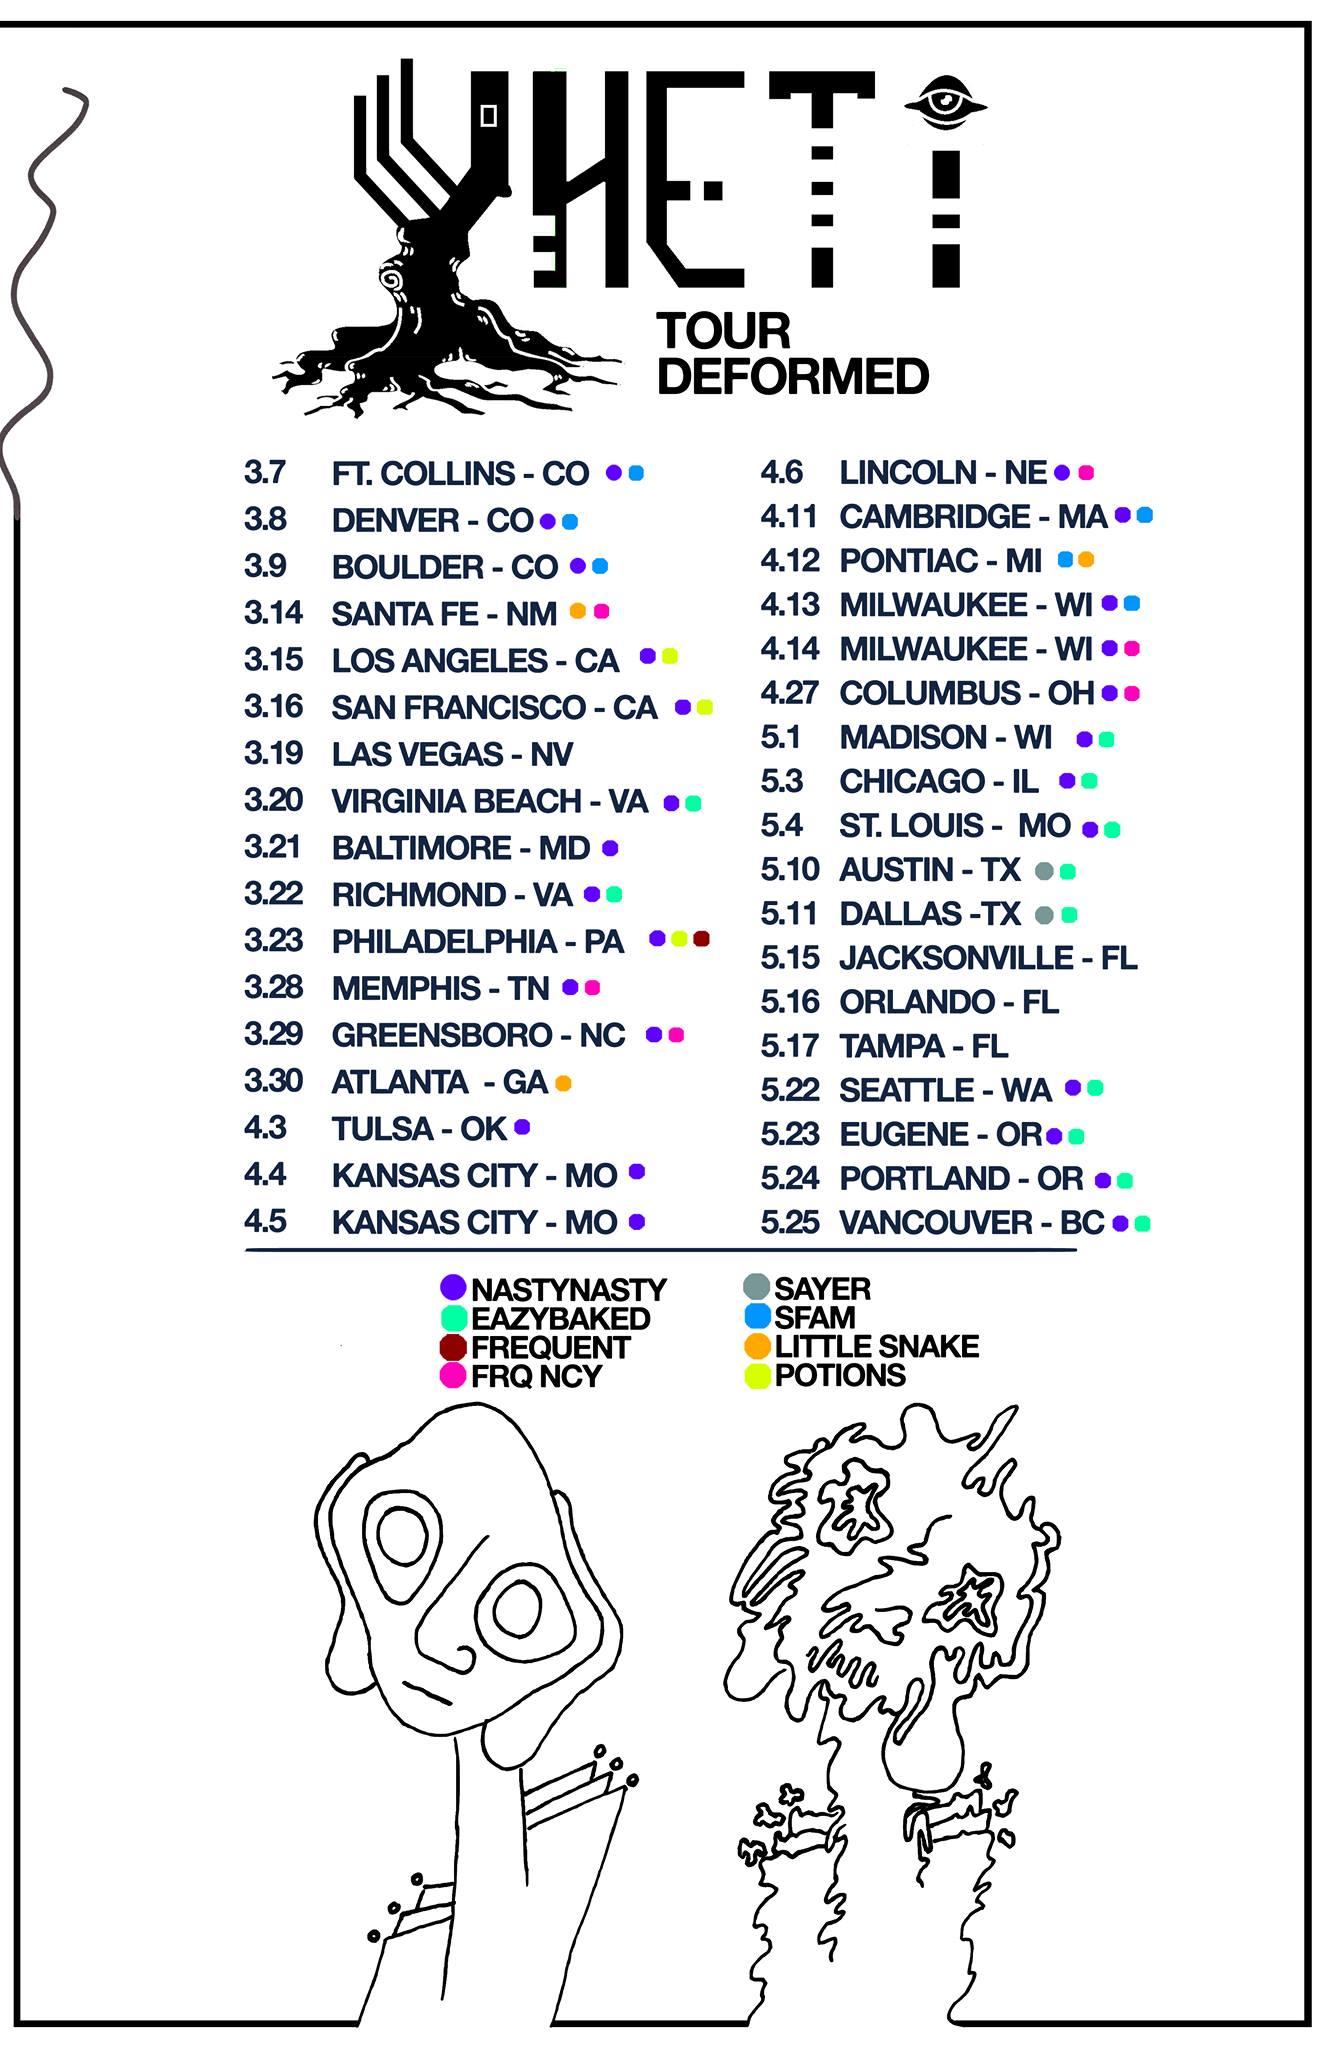 Yheti Tour Deformed Poster